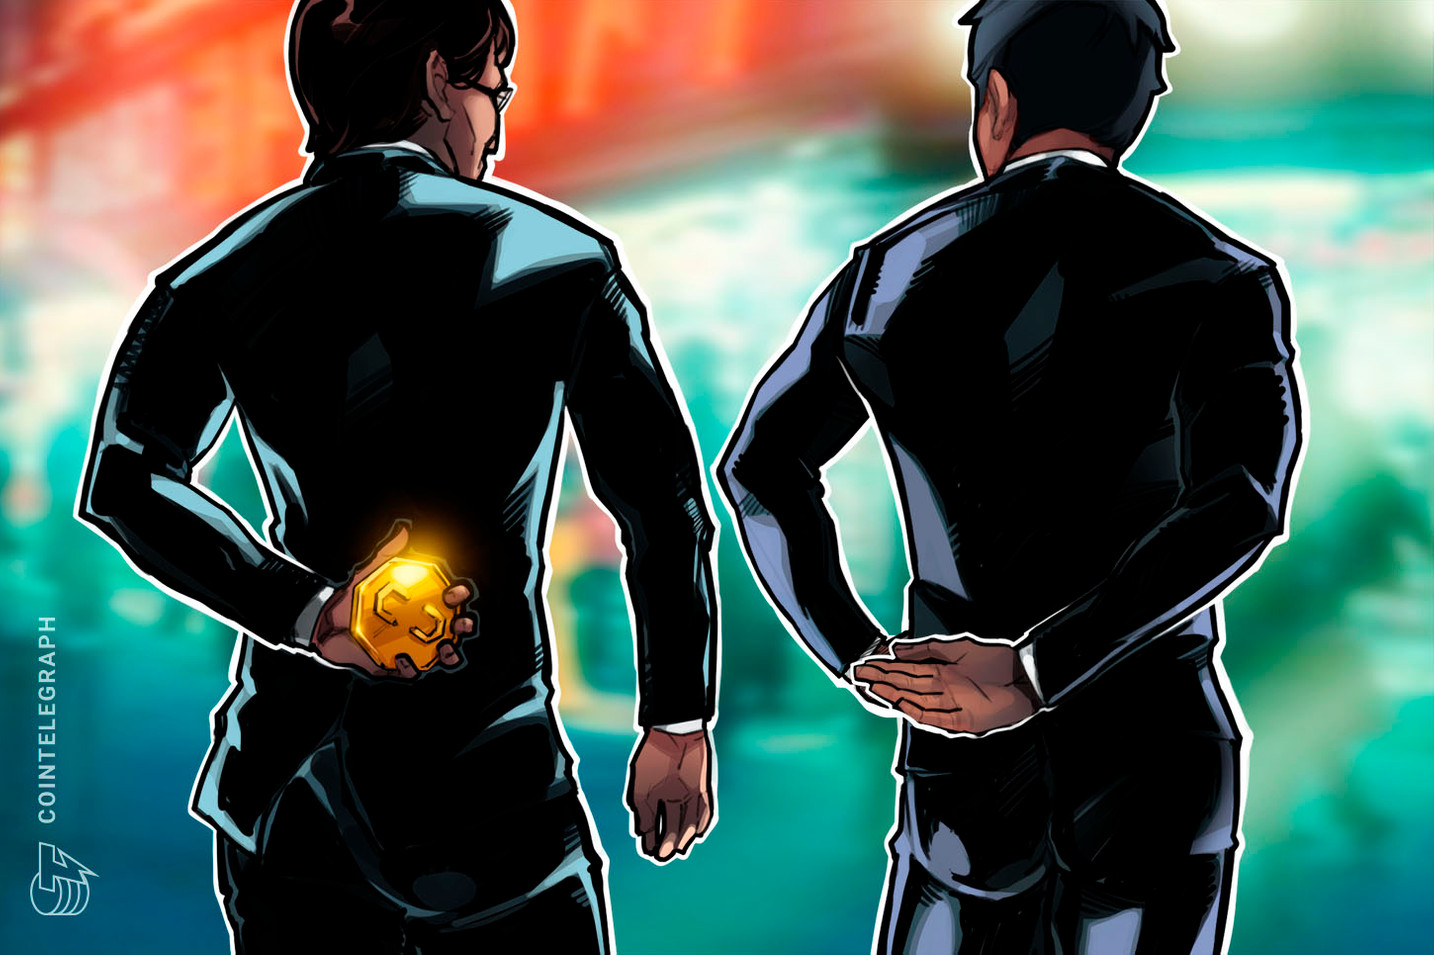 Regulador chino acusa a los exchanges de criptomonedas de mostrar volúmenes fraudulentos